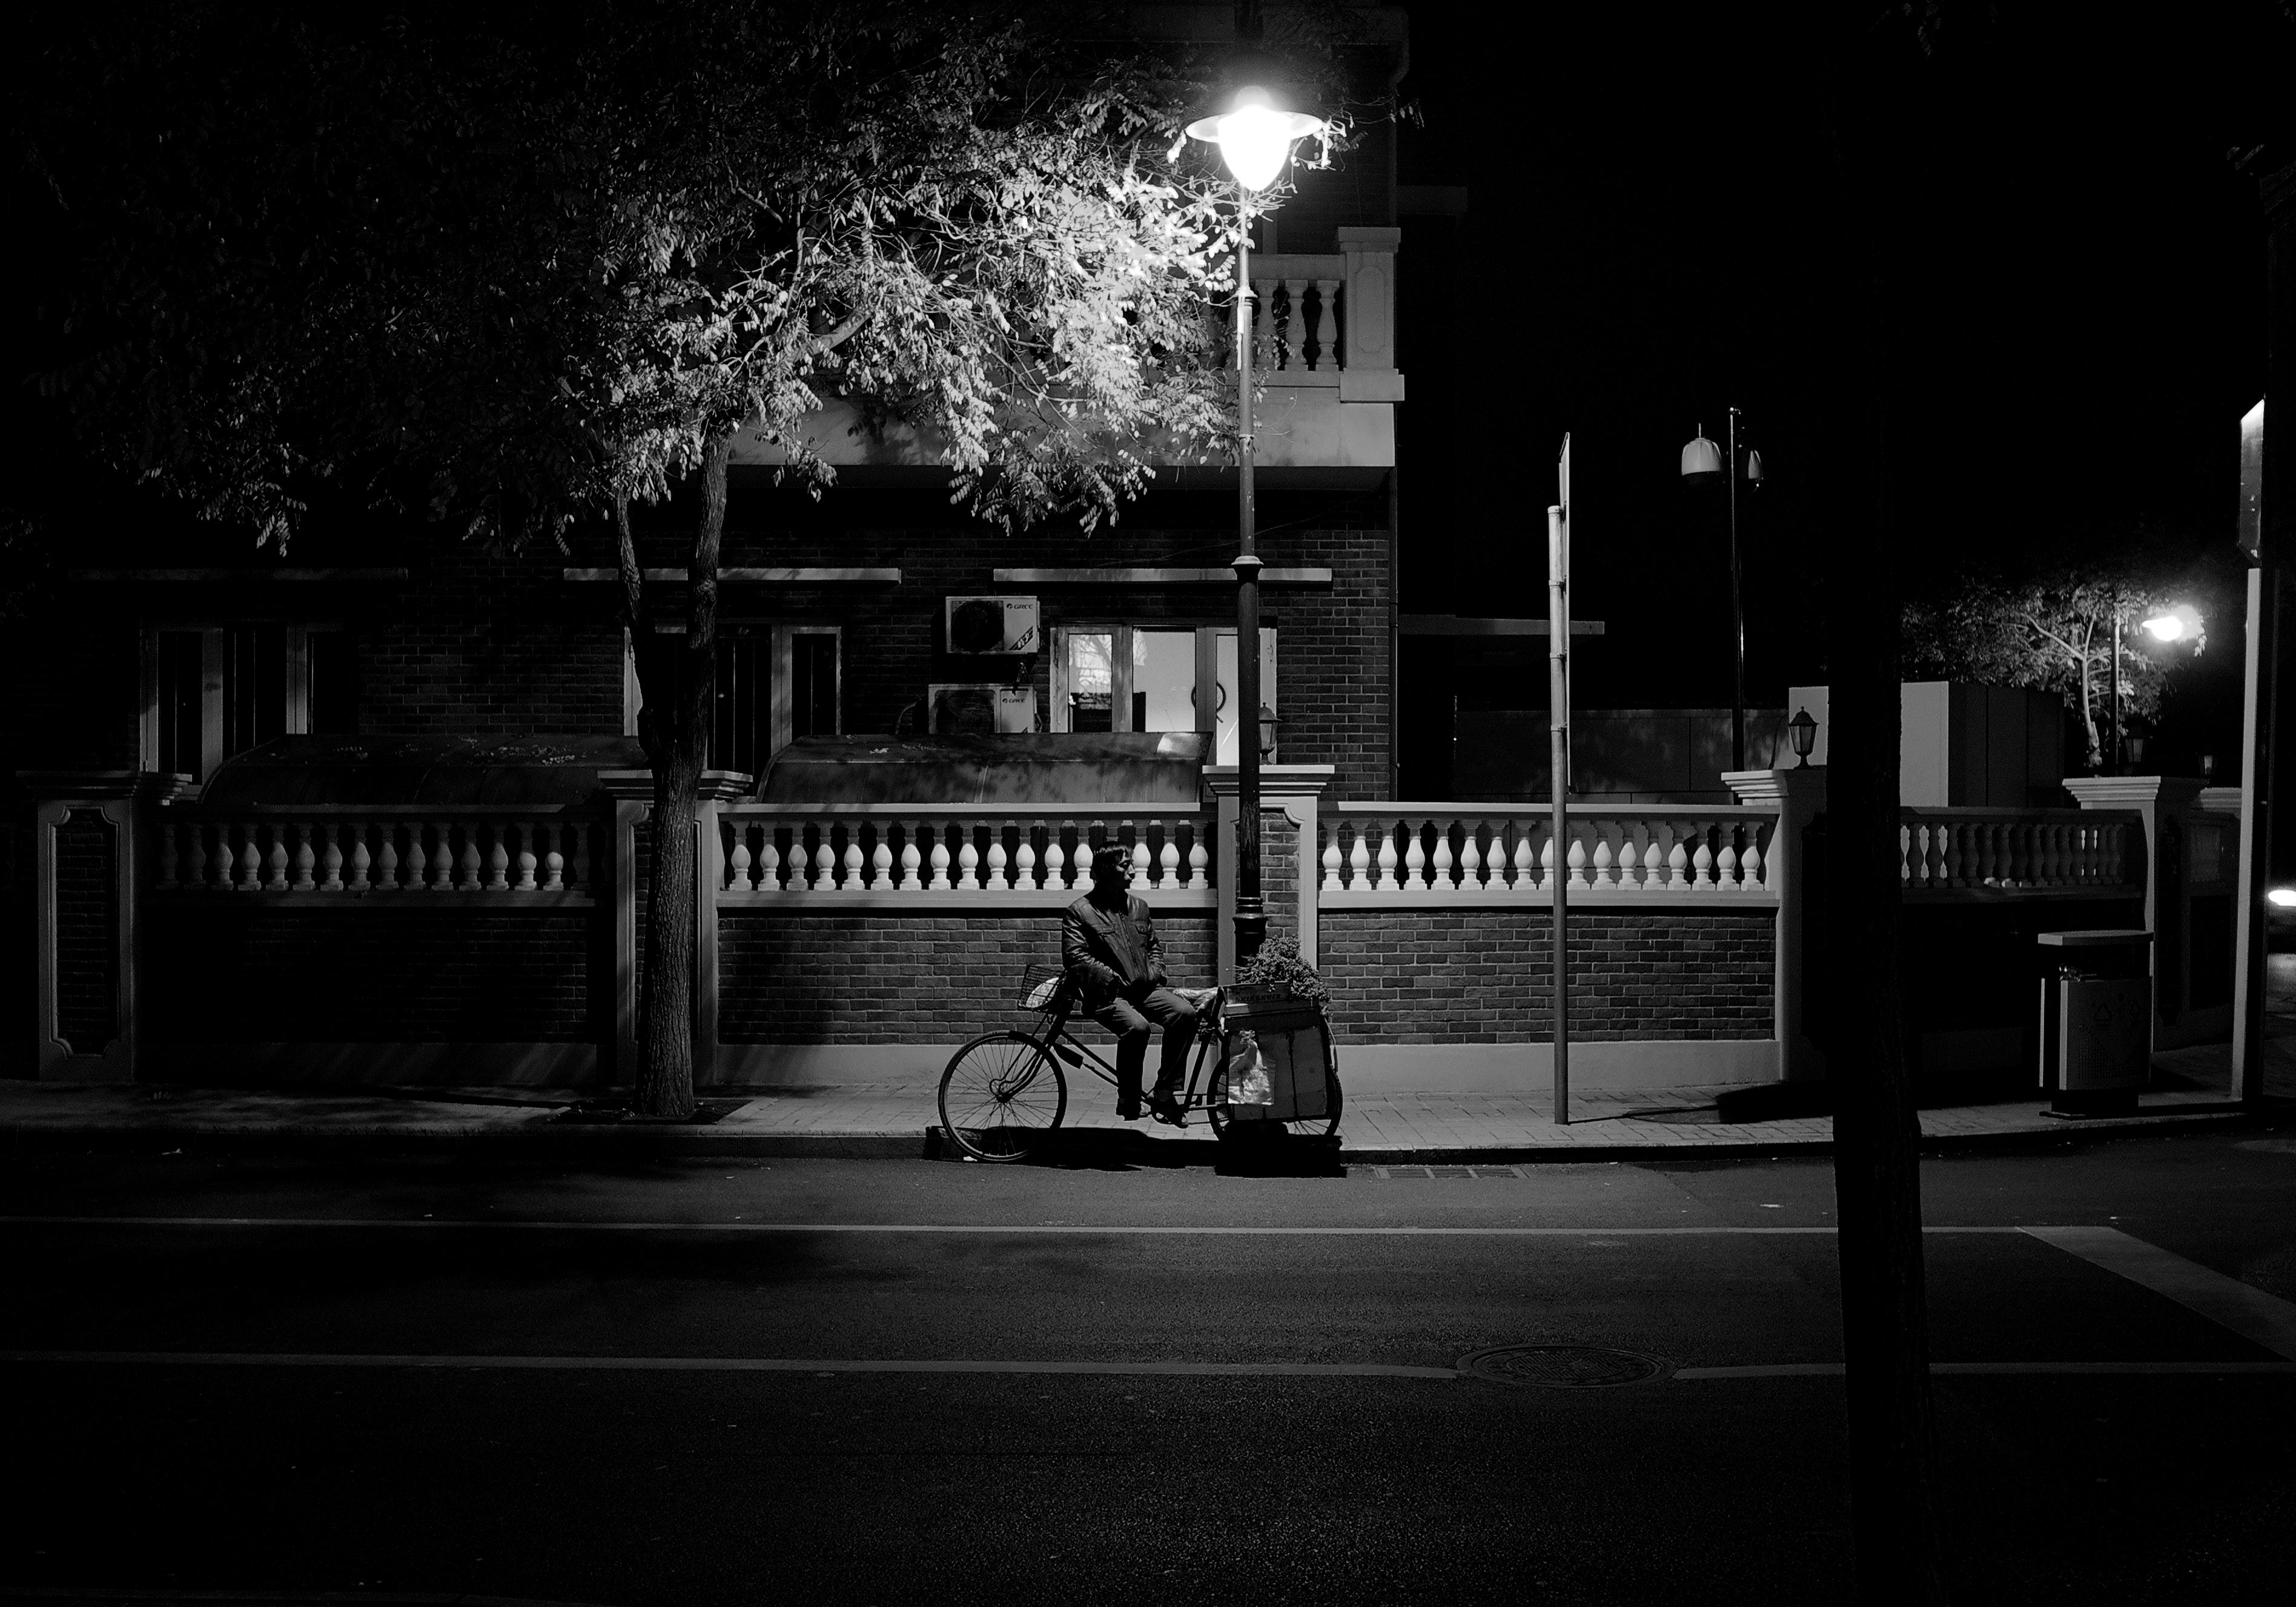 Street light white black monochrome city street night road photography infrastructure light bw stories lighting shape